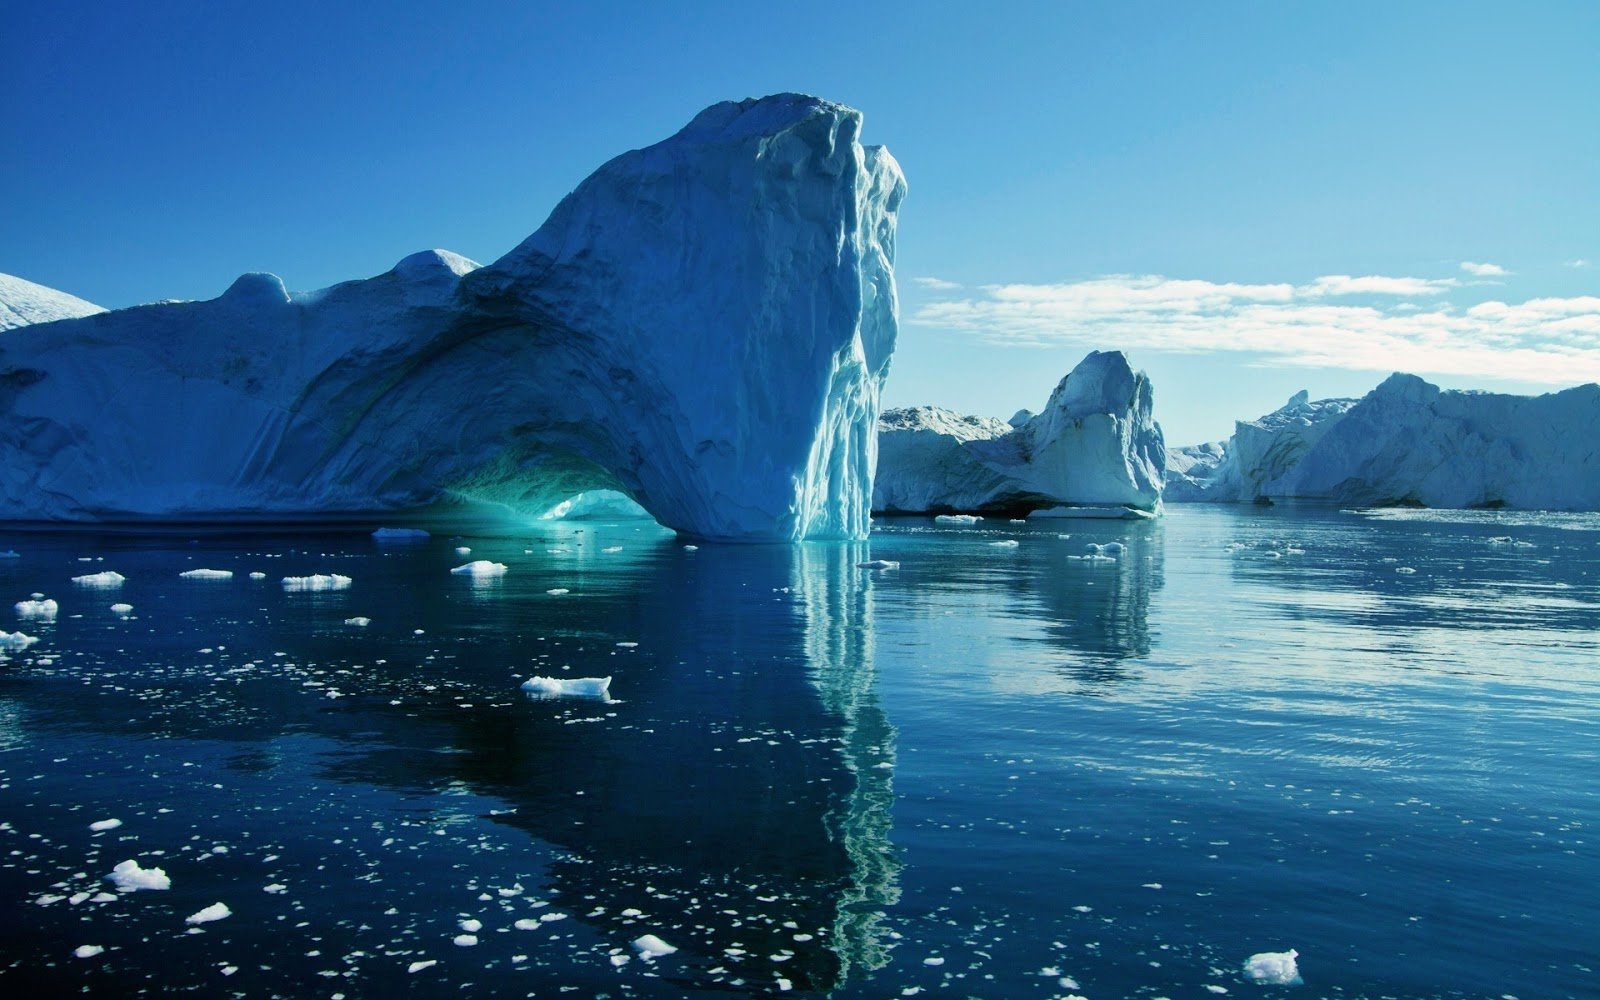 Naturaleza Gran Iceberg Wallpaper HD 1920x1200 1600x1000